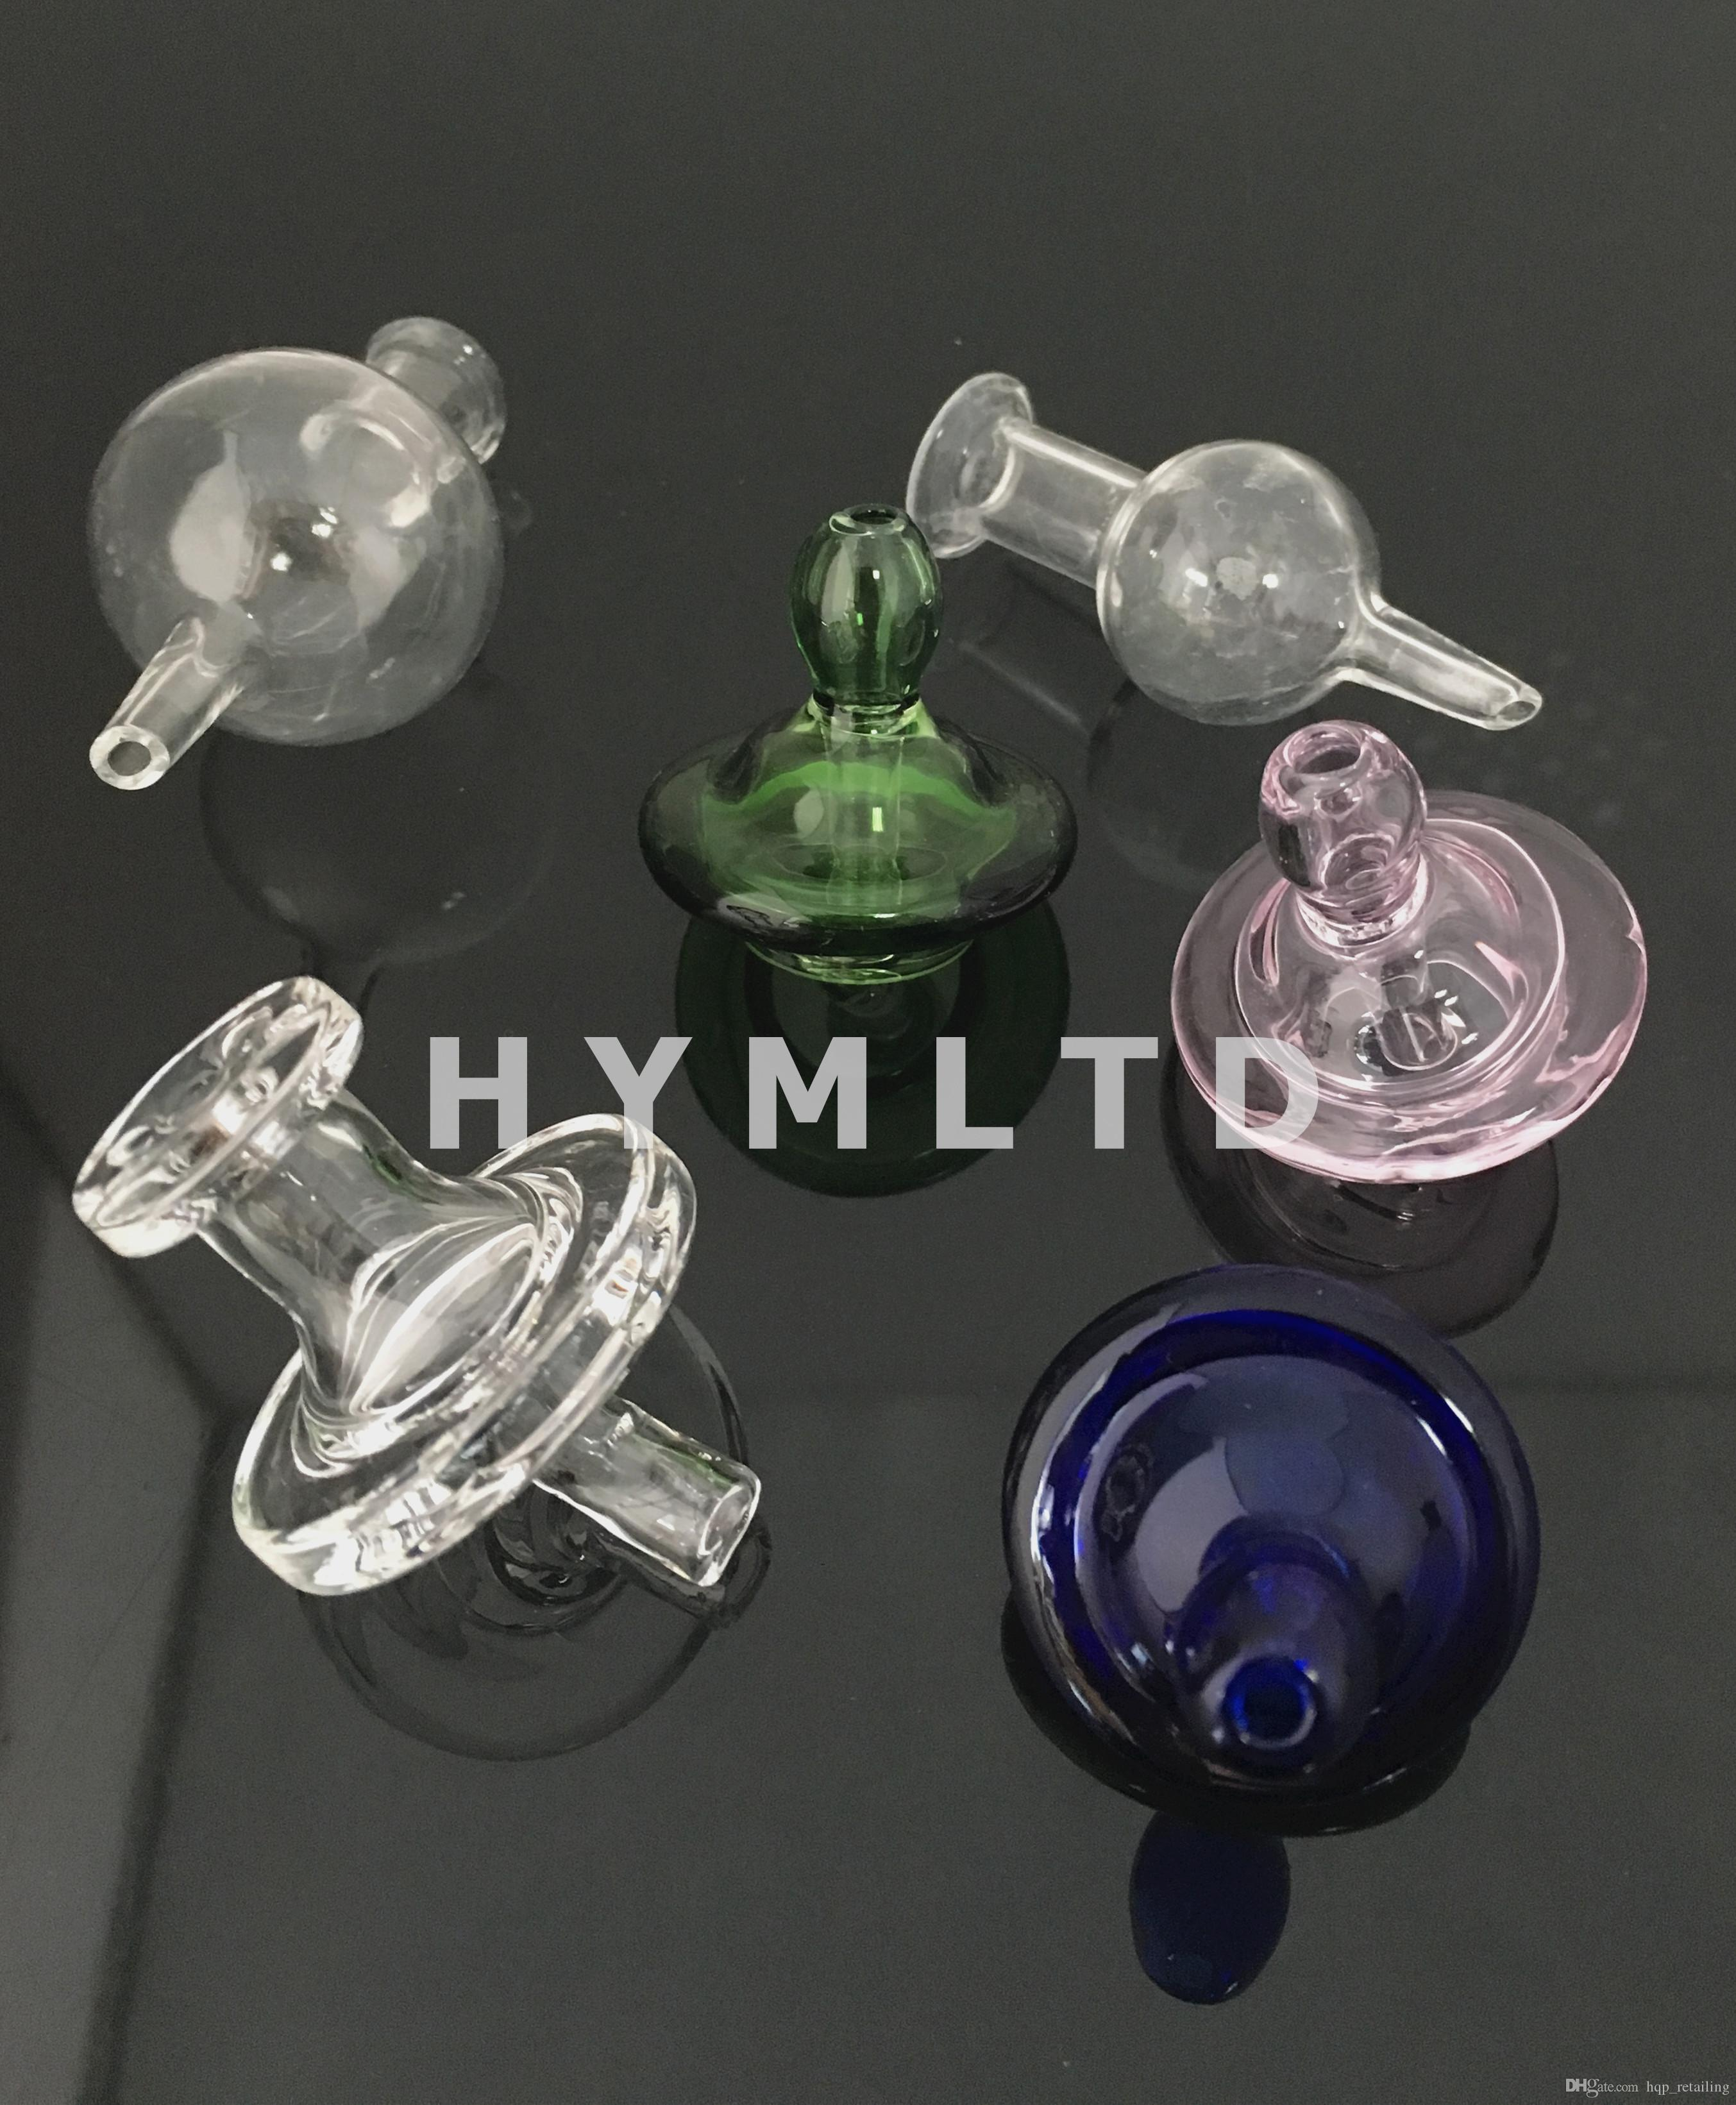 Colored Hover Cap Glass Carb Cap Matching Thermal Quartz Banger Nail